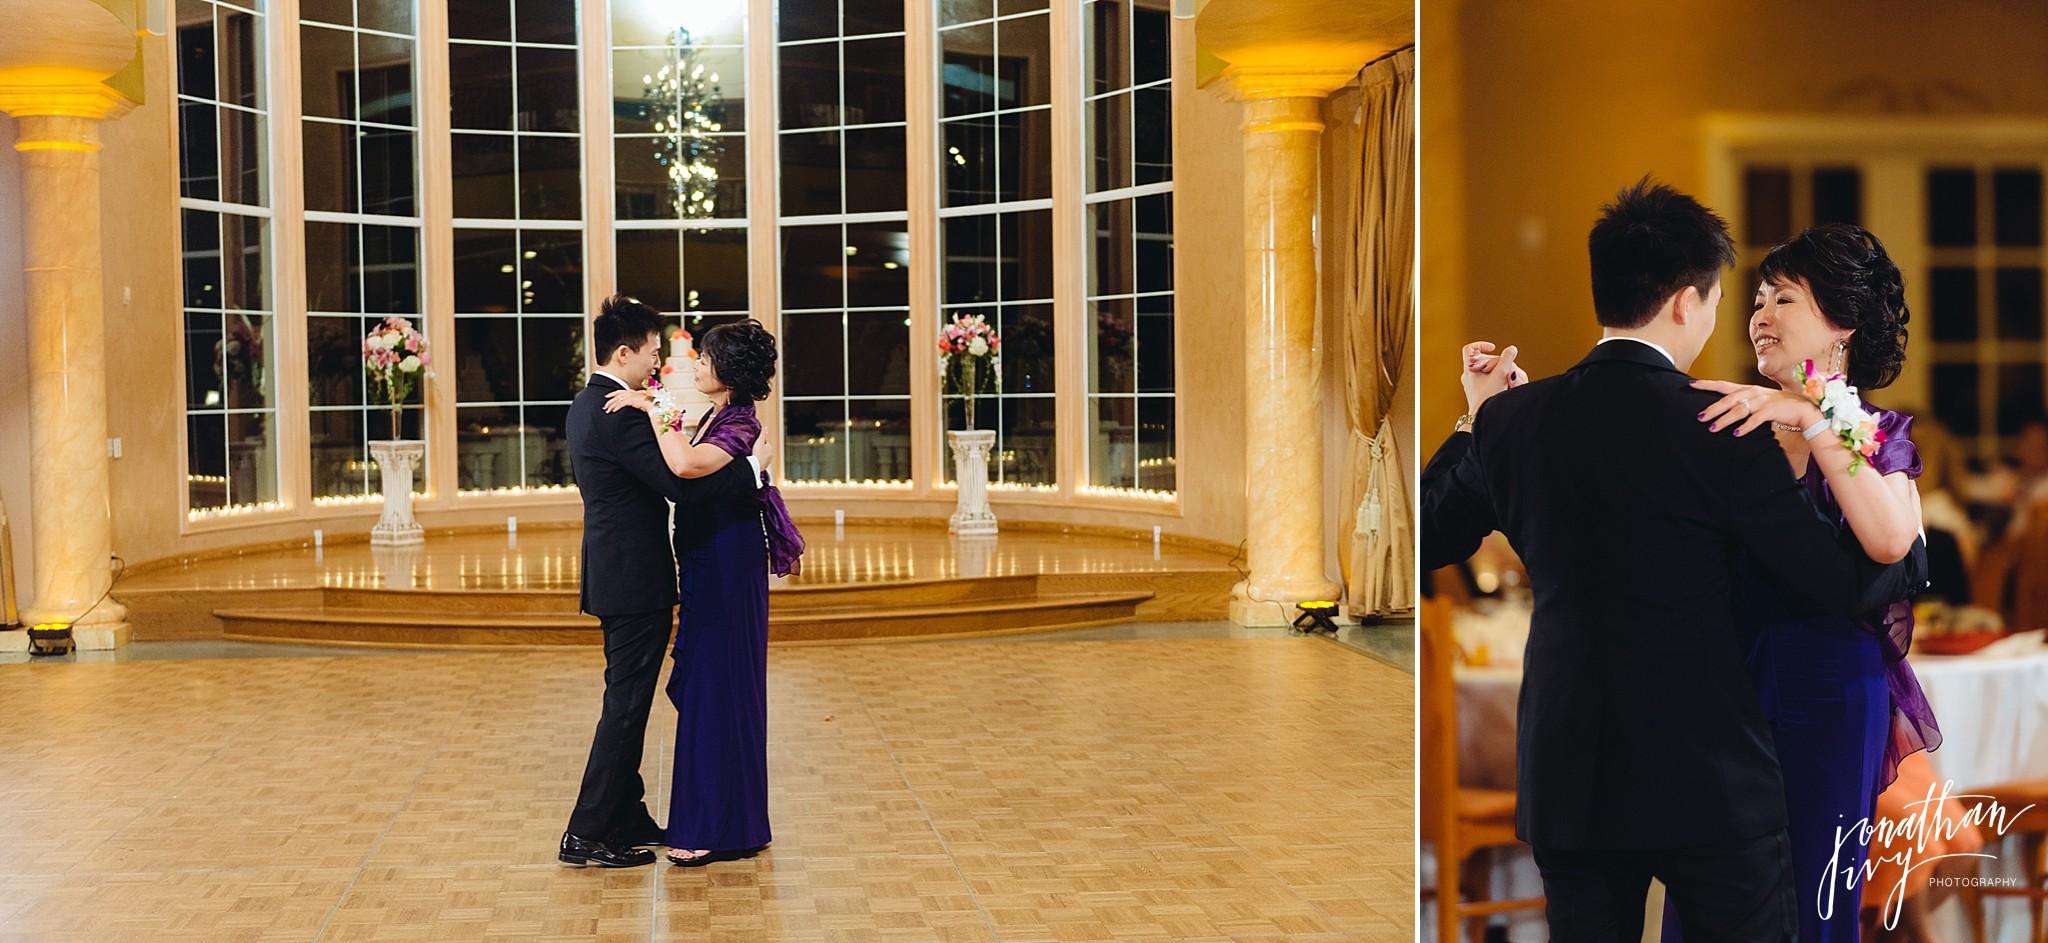 Chateau-Polonez-Wedding-Houston_0038.jpg